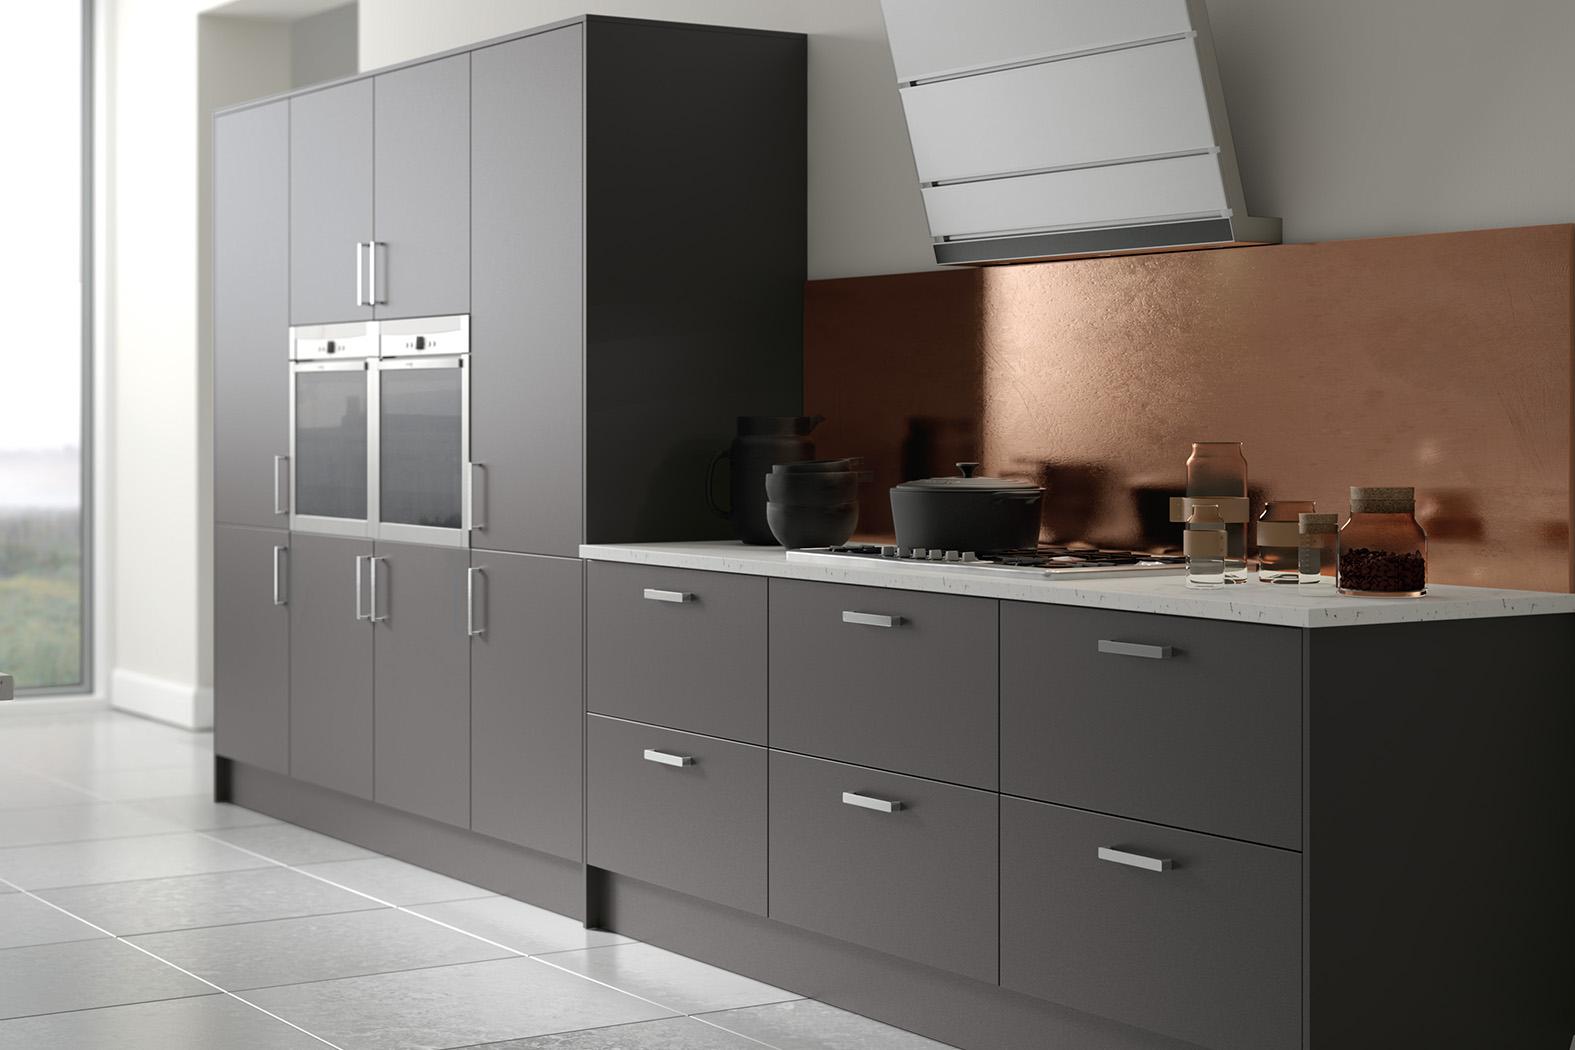 Supermatt Graphite : Cheap Kitchen Units And Cabinets For